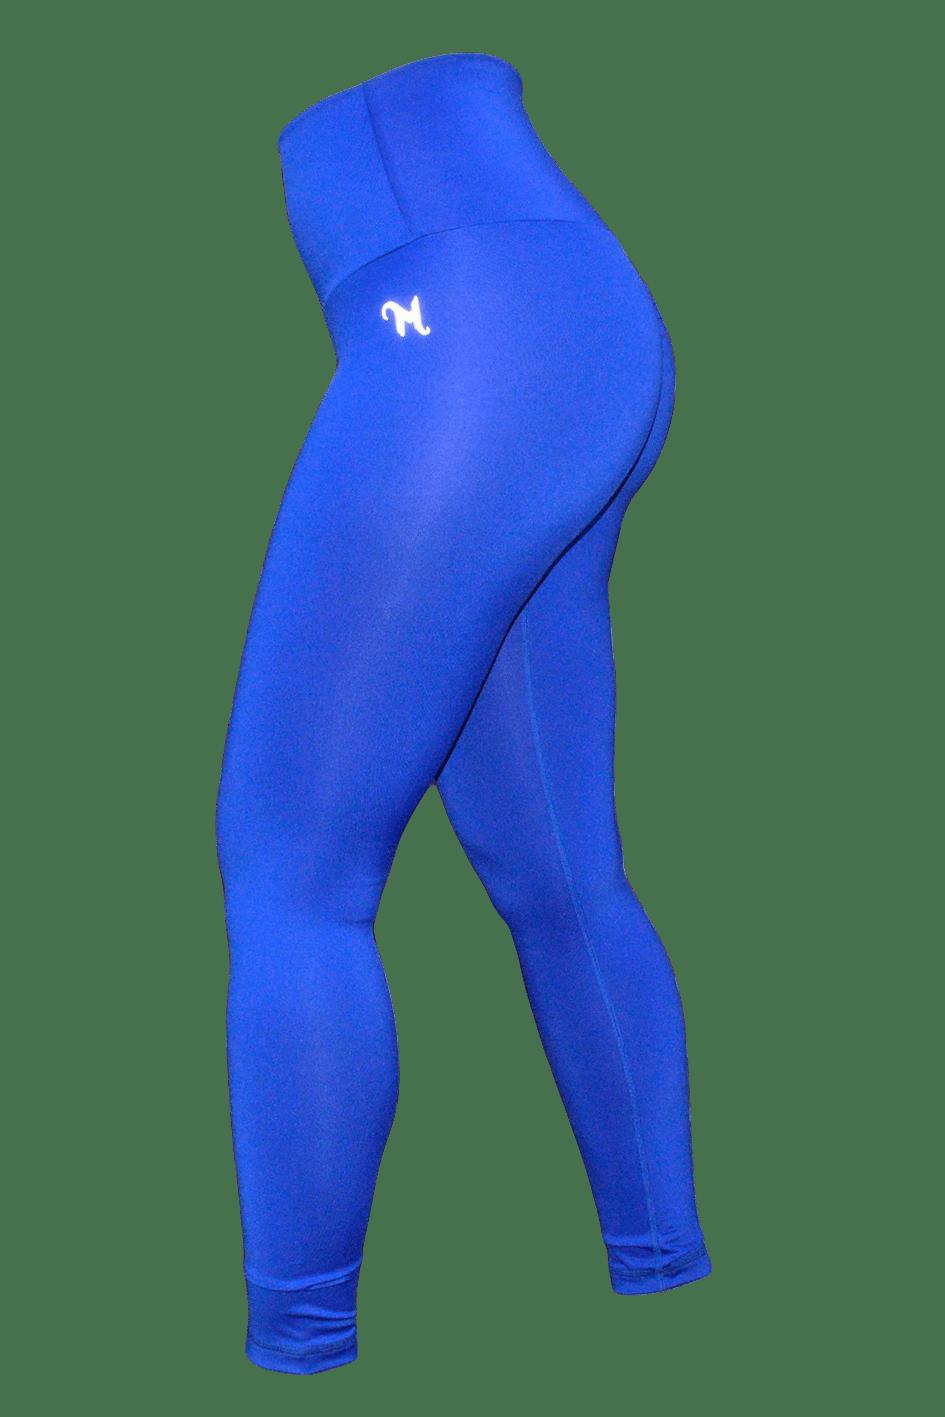 Shaper-royal-blue-Mfit